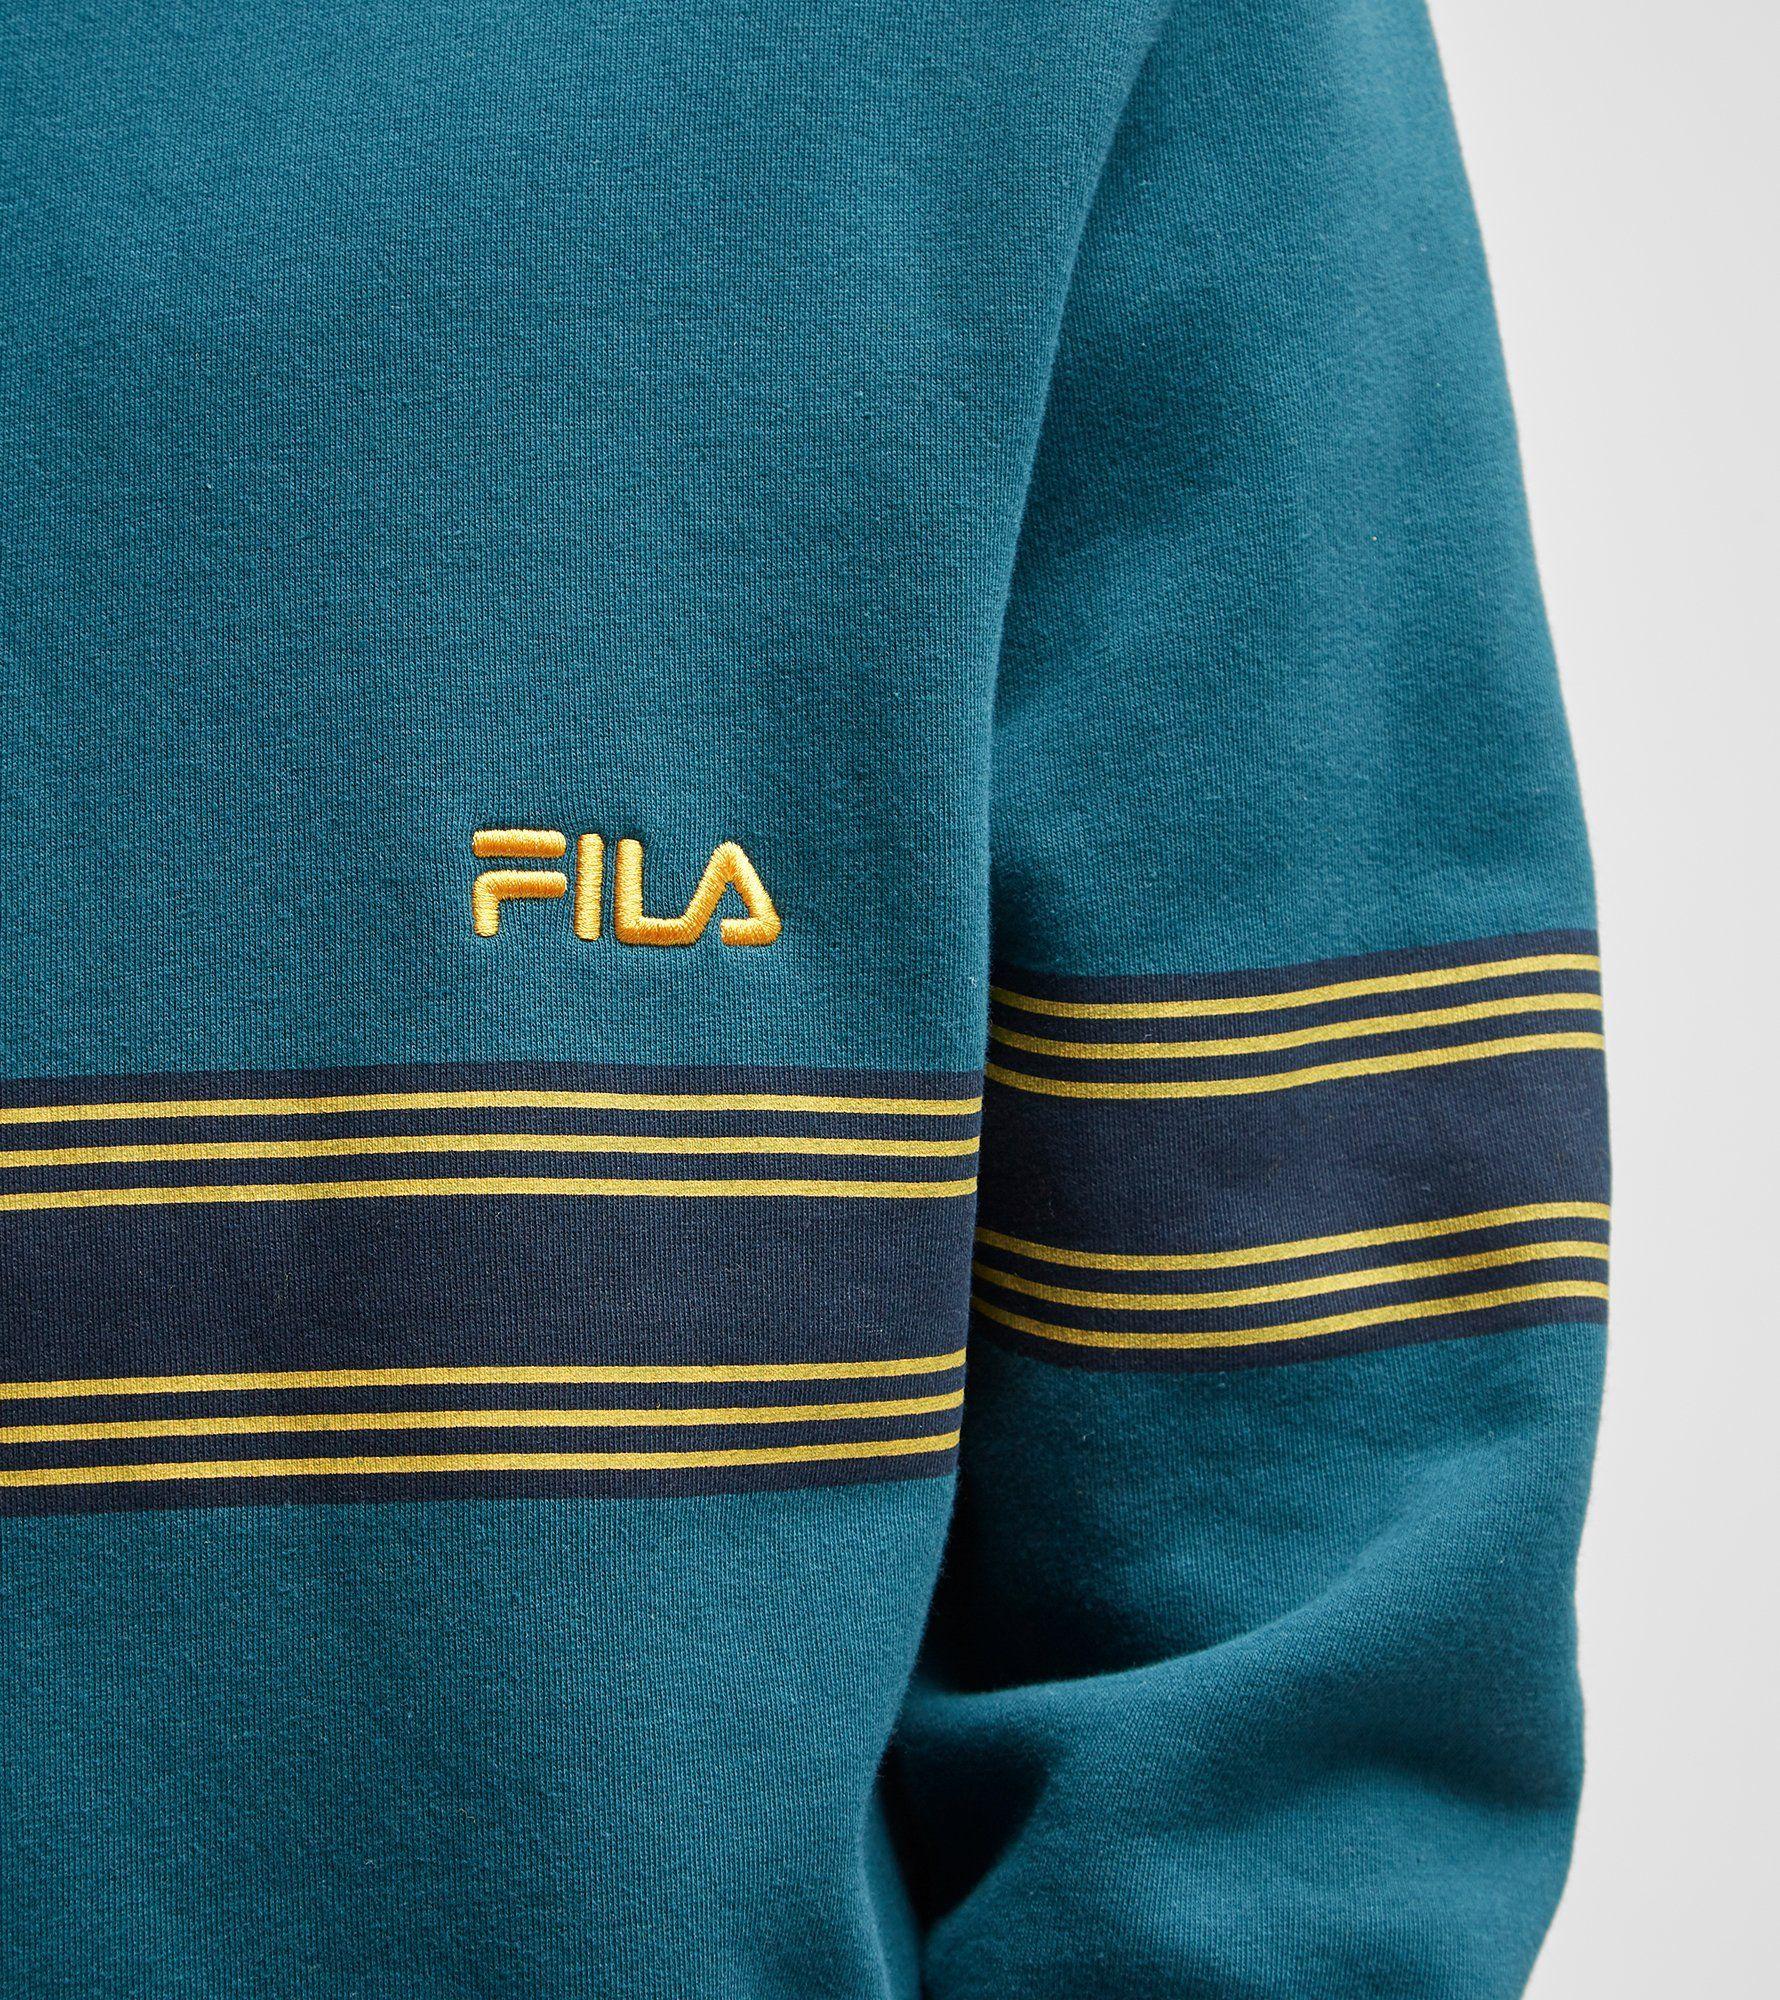 Fila Annapurna Rugby Crew Sweatshirt